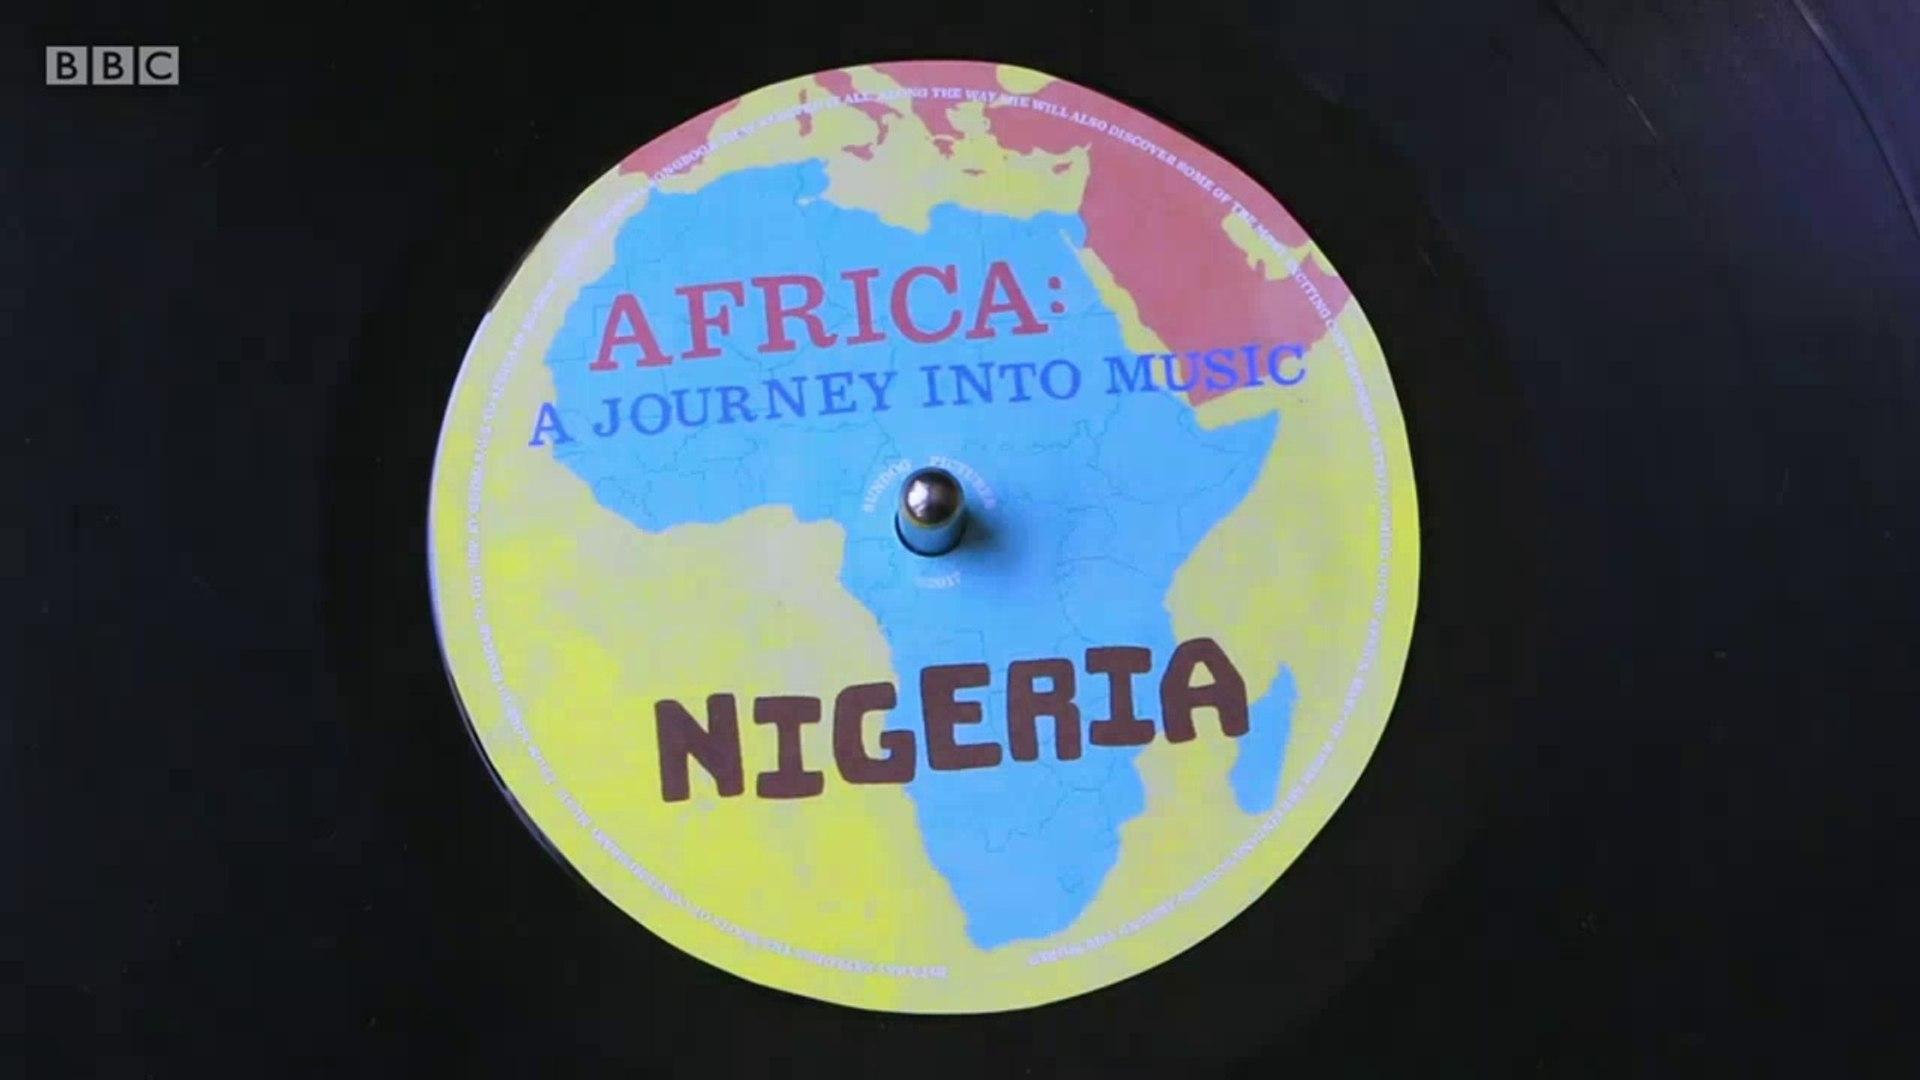 Africa.A.Journey.into.Music.S01E01.Nigeria